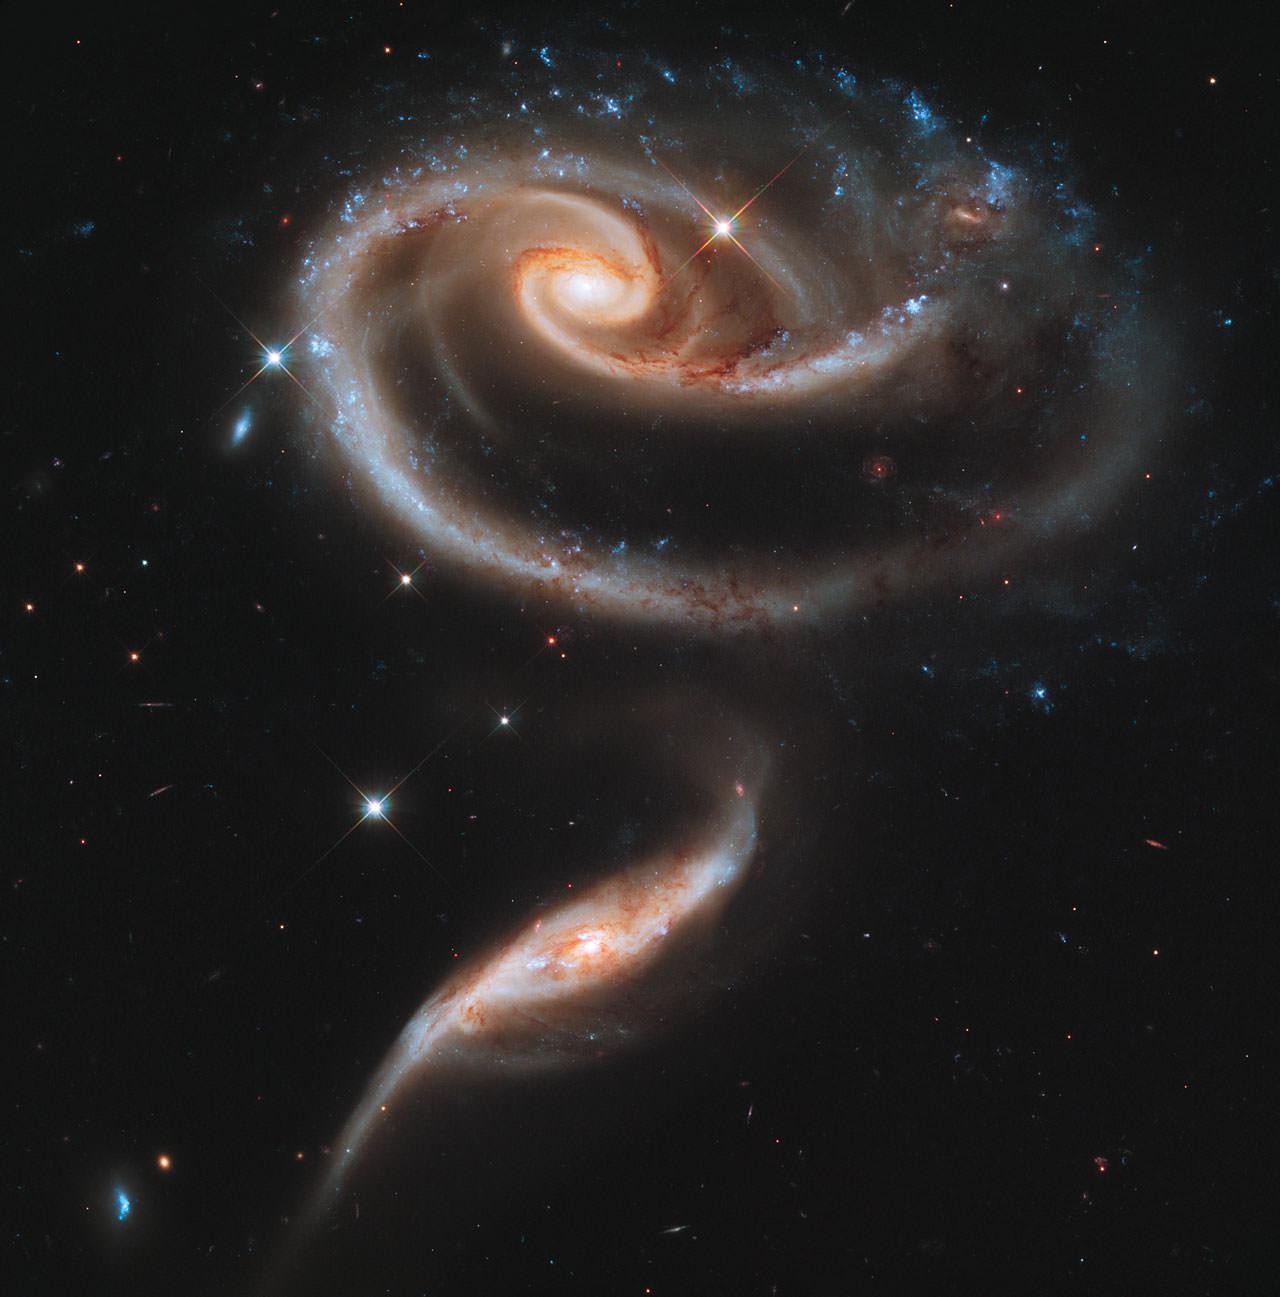 hubble telescope constellation - photo #23